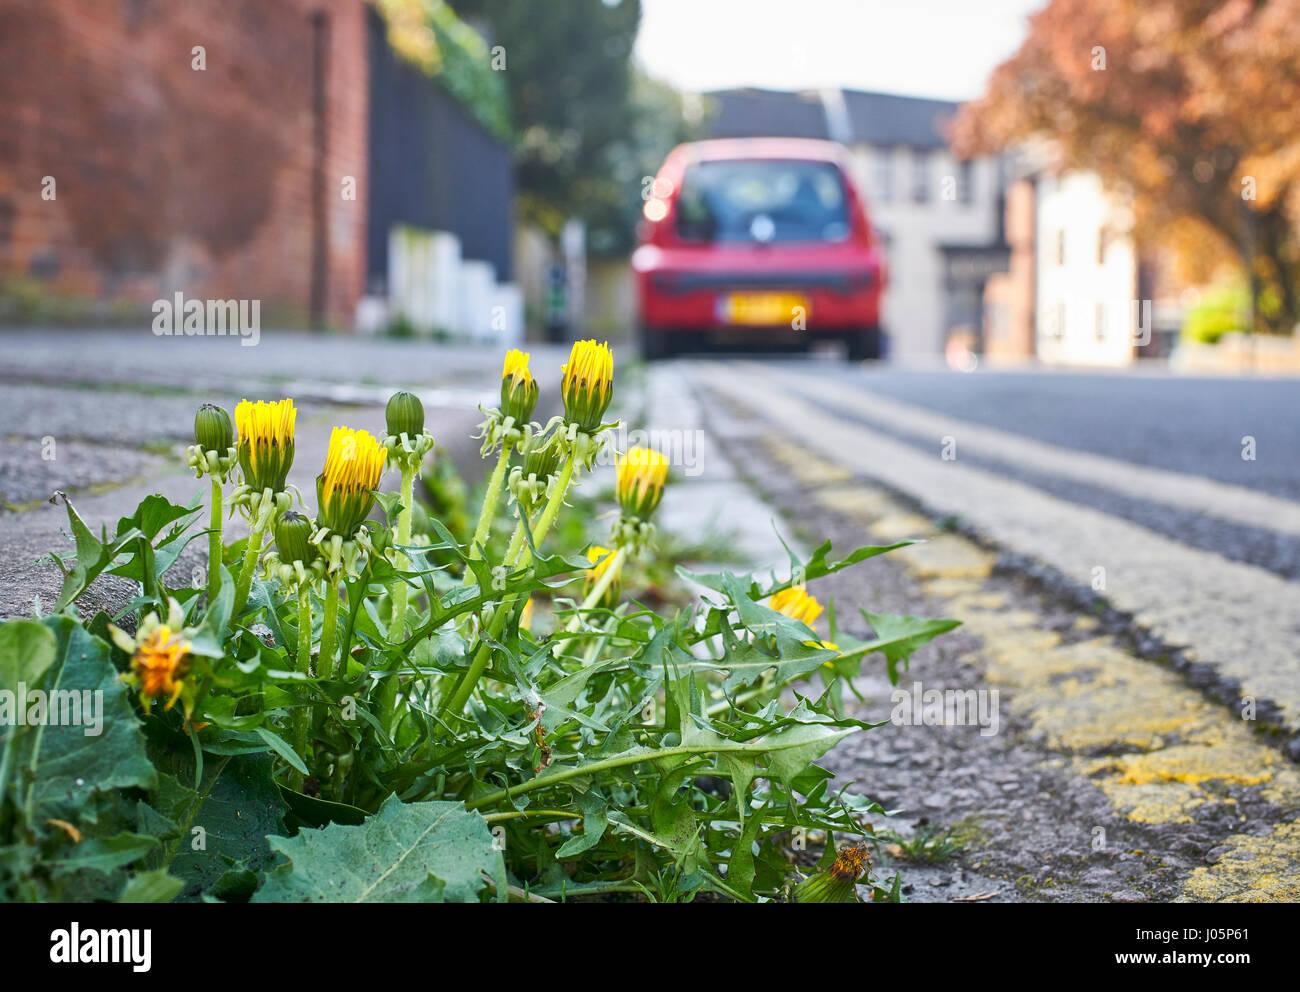 Dandelion weeds growing in the road in an urban street - Stock Image